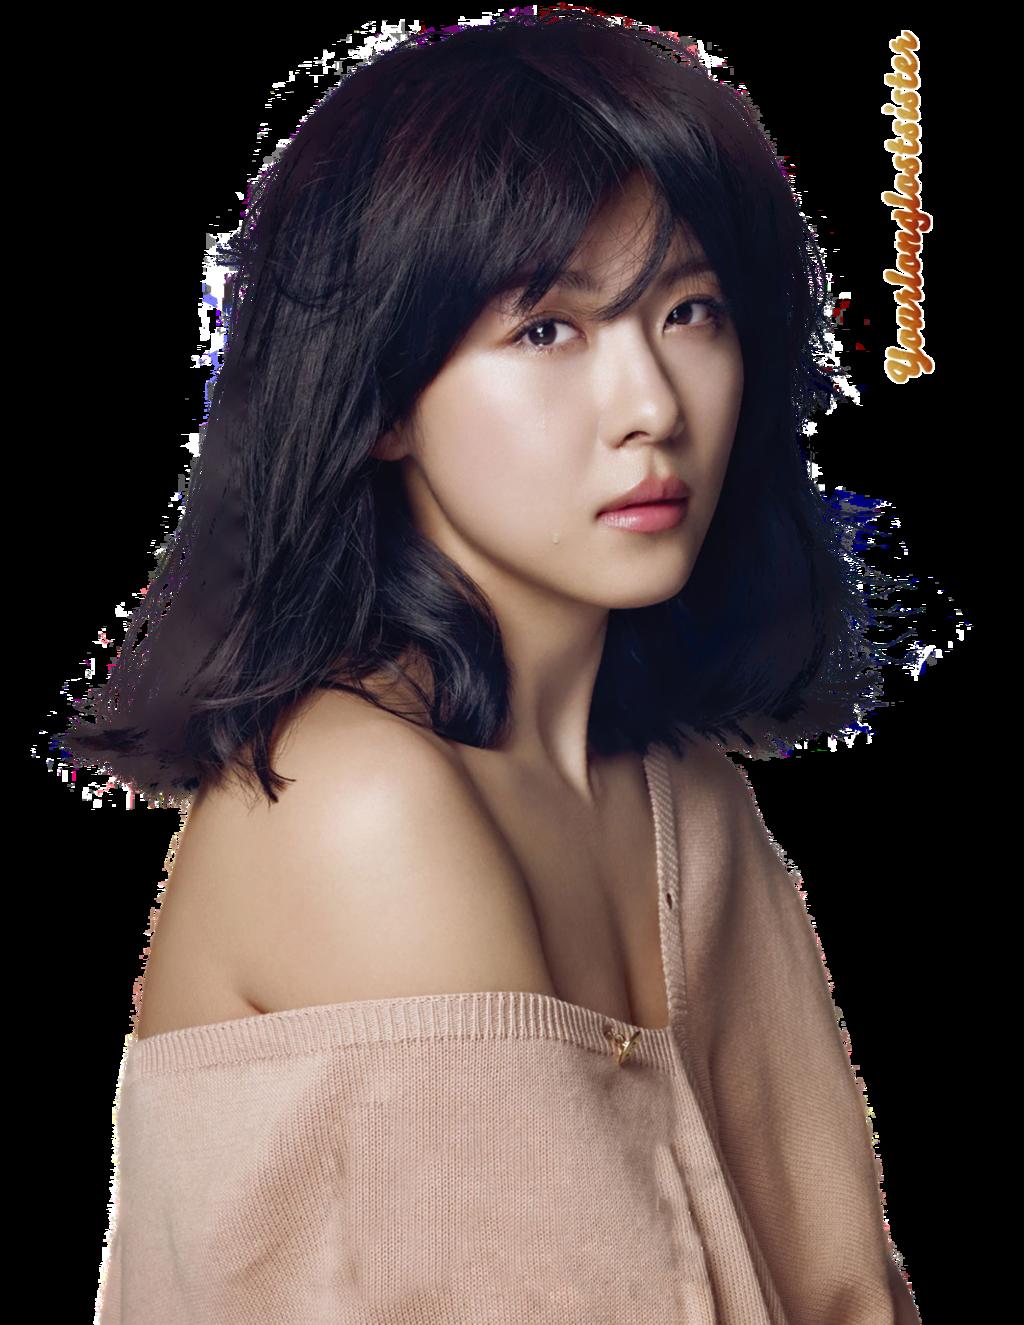 HQ Ha Ji-won Wallpapers | File 1570.69Kb